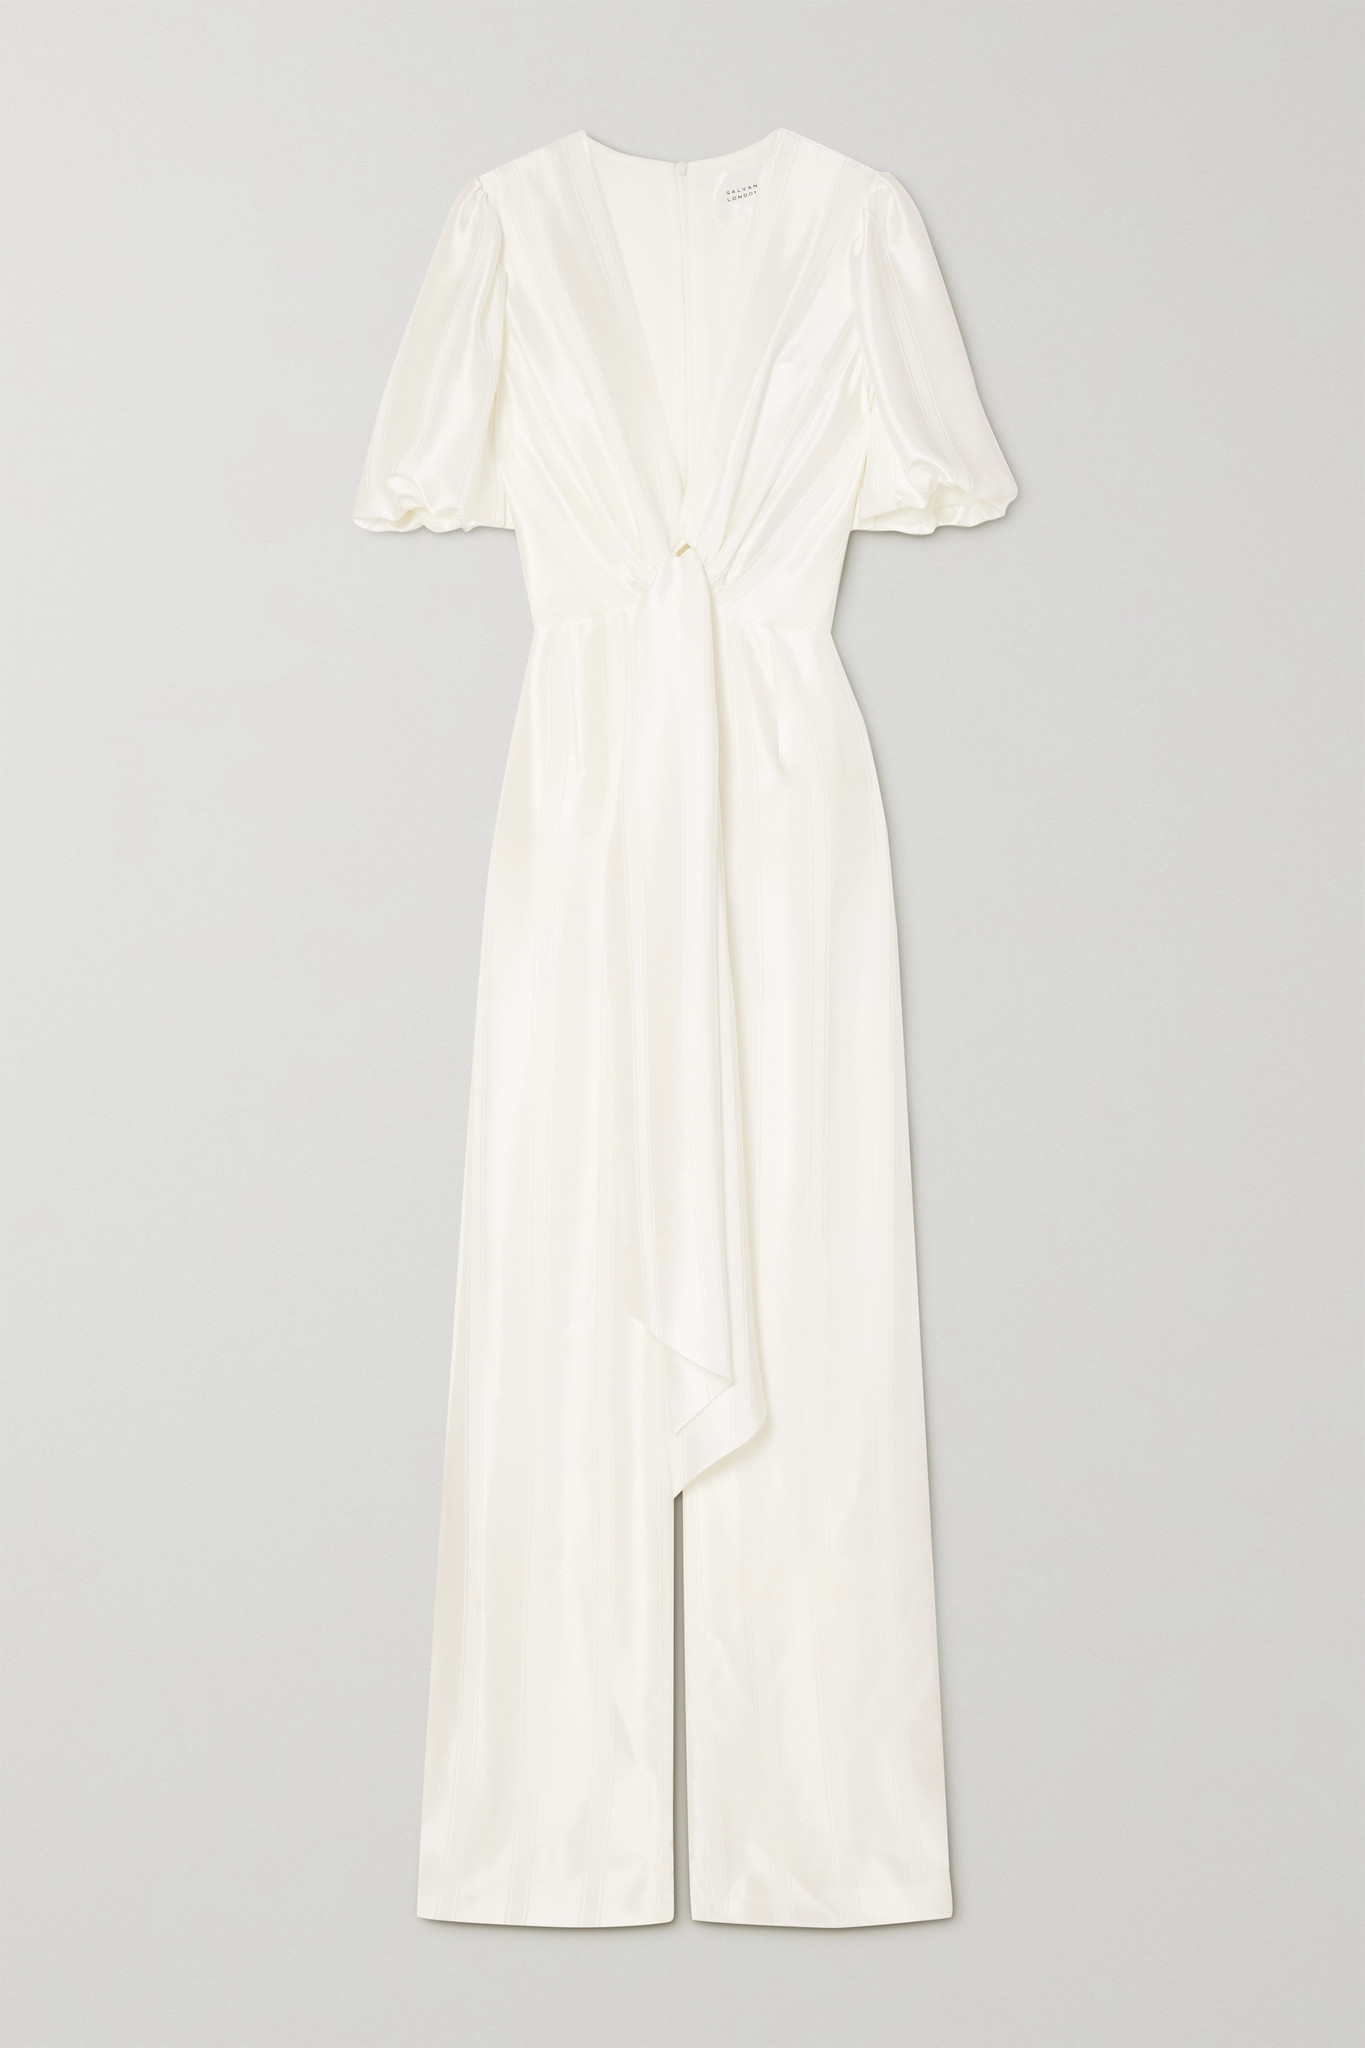 GALVAN - Eden 结饰条纹缎布连身裤 - 白色 - FR40